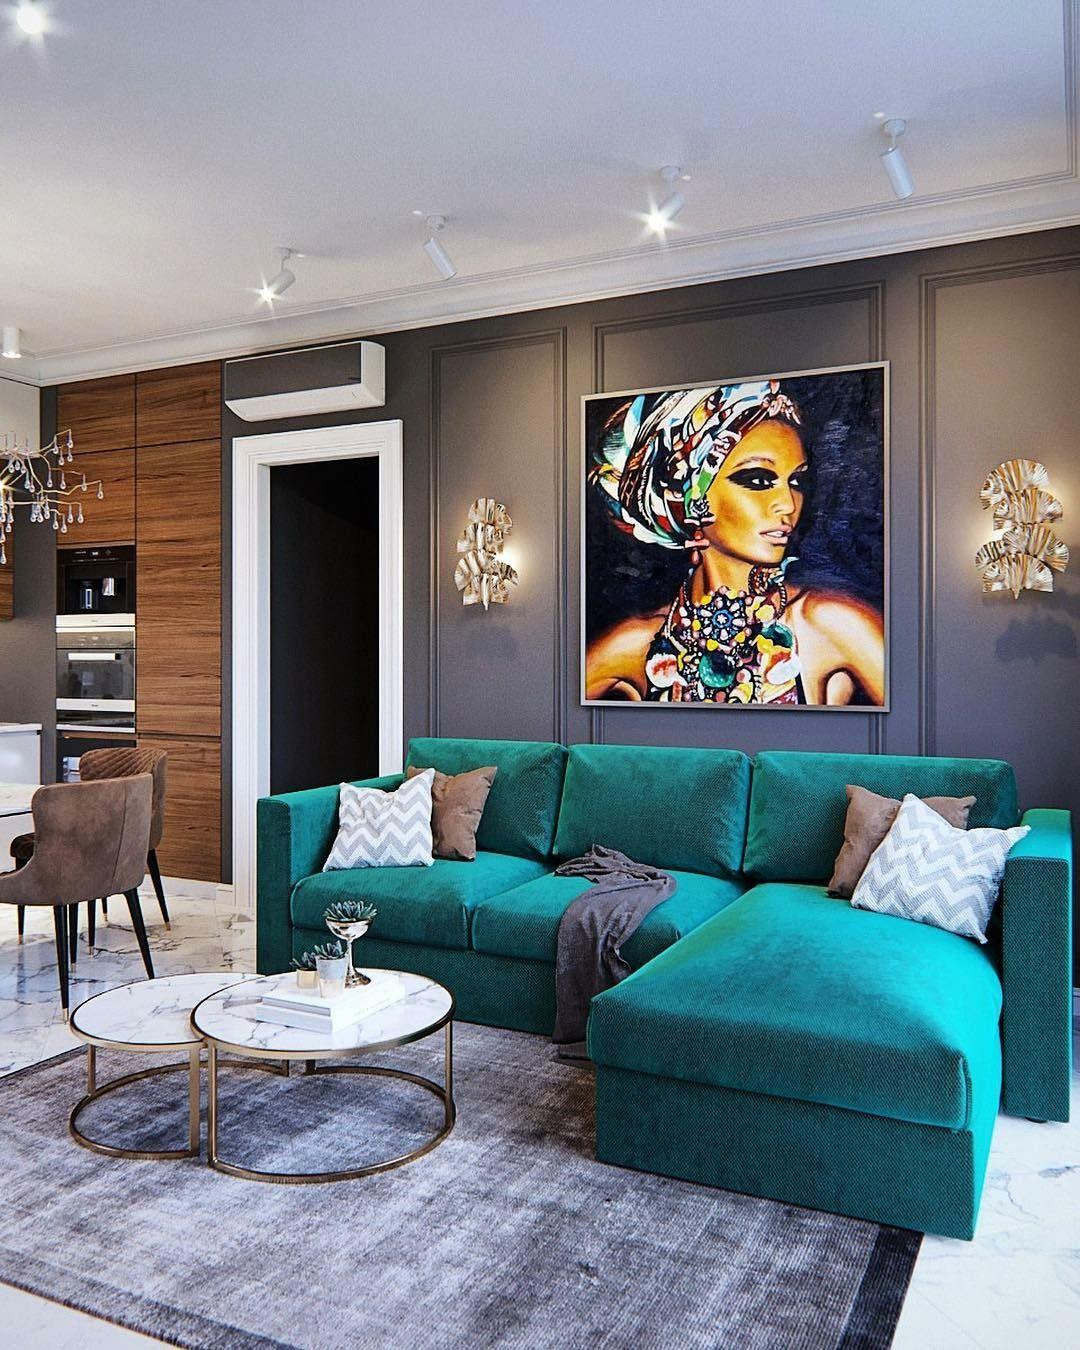 Back Wall Ideas Living Room Decor Apartment Chic Living